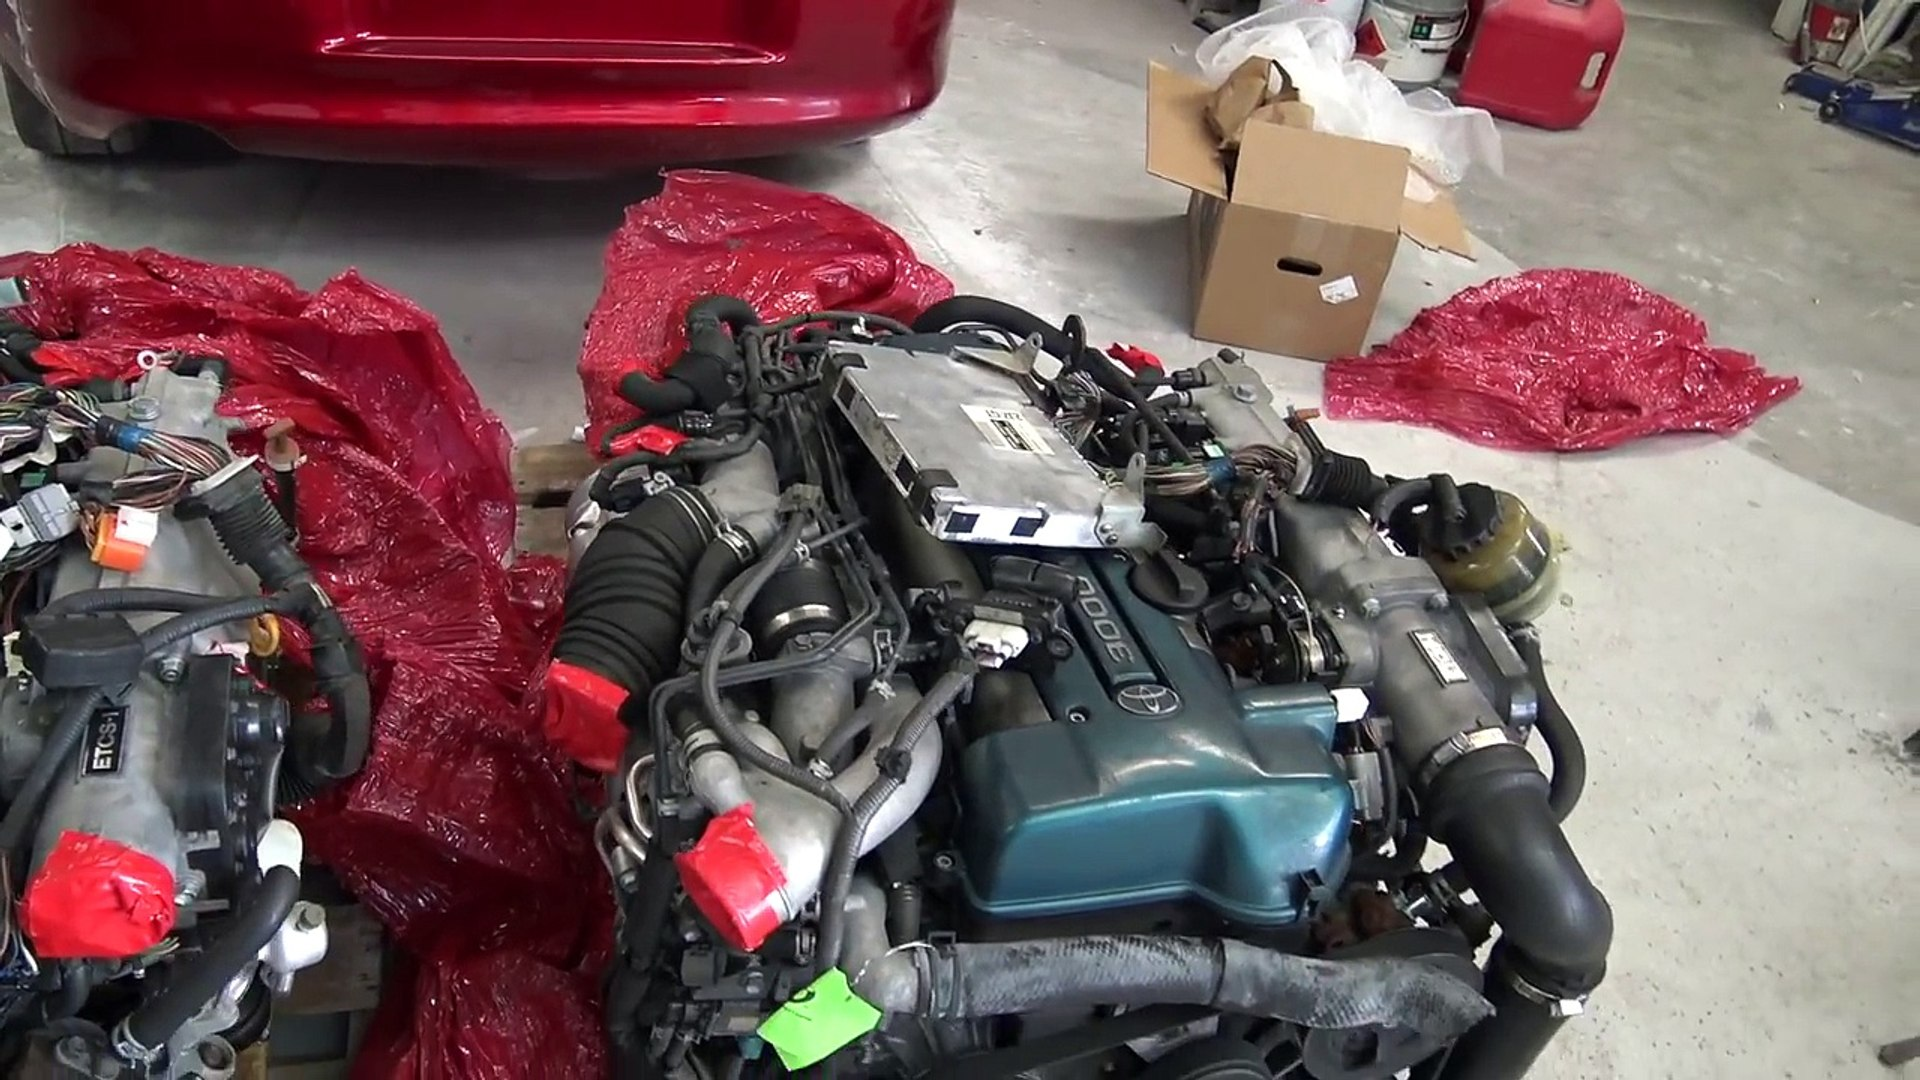 JDM 2JZGTE VVTI ENGINE FOR THE MKIV SUPRA! | + Future fabrication v band  turbo manifold!